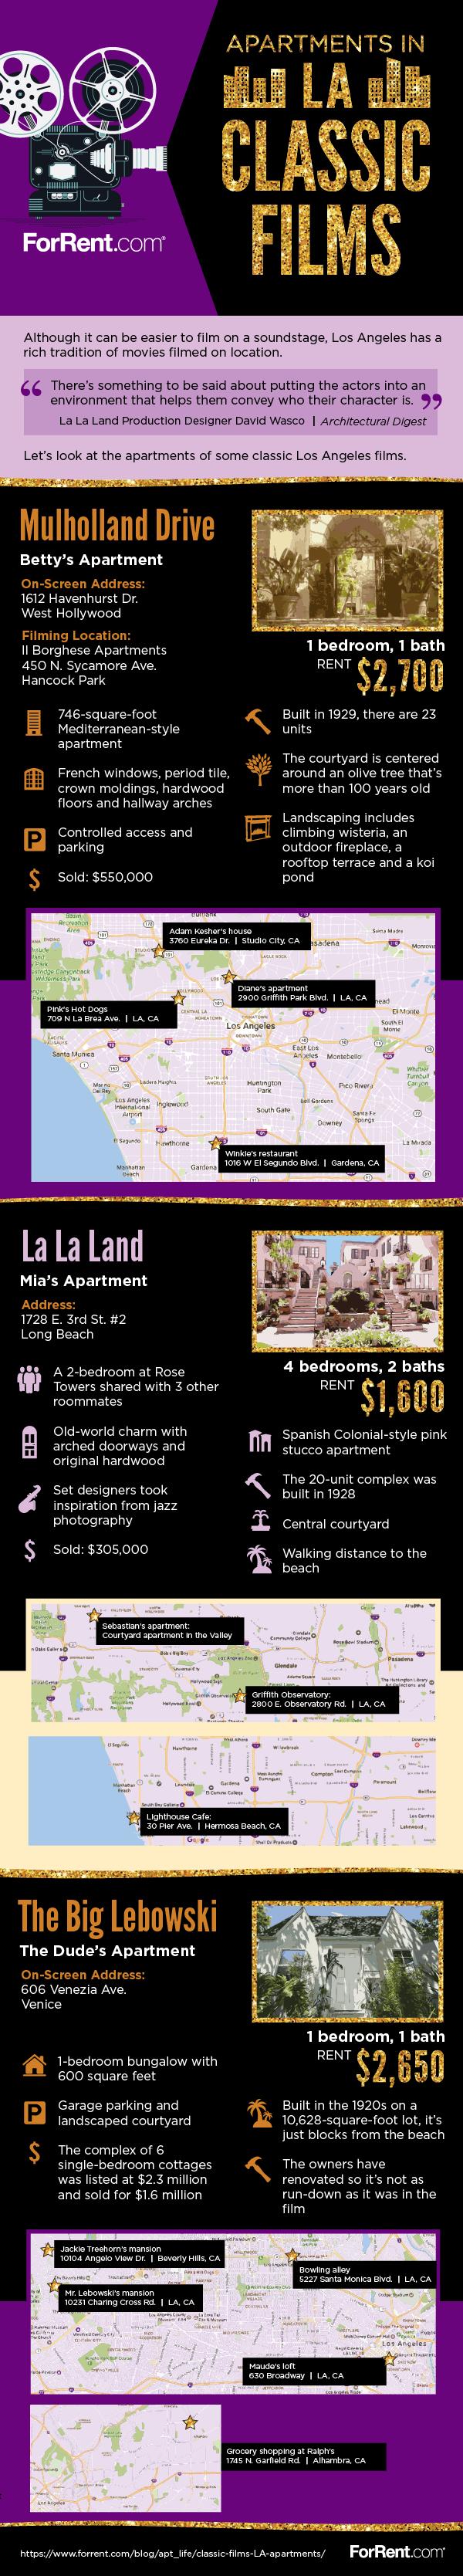 Apartments in Classic LA Films